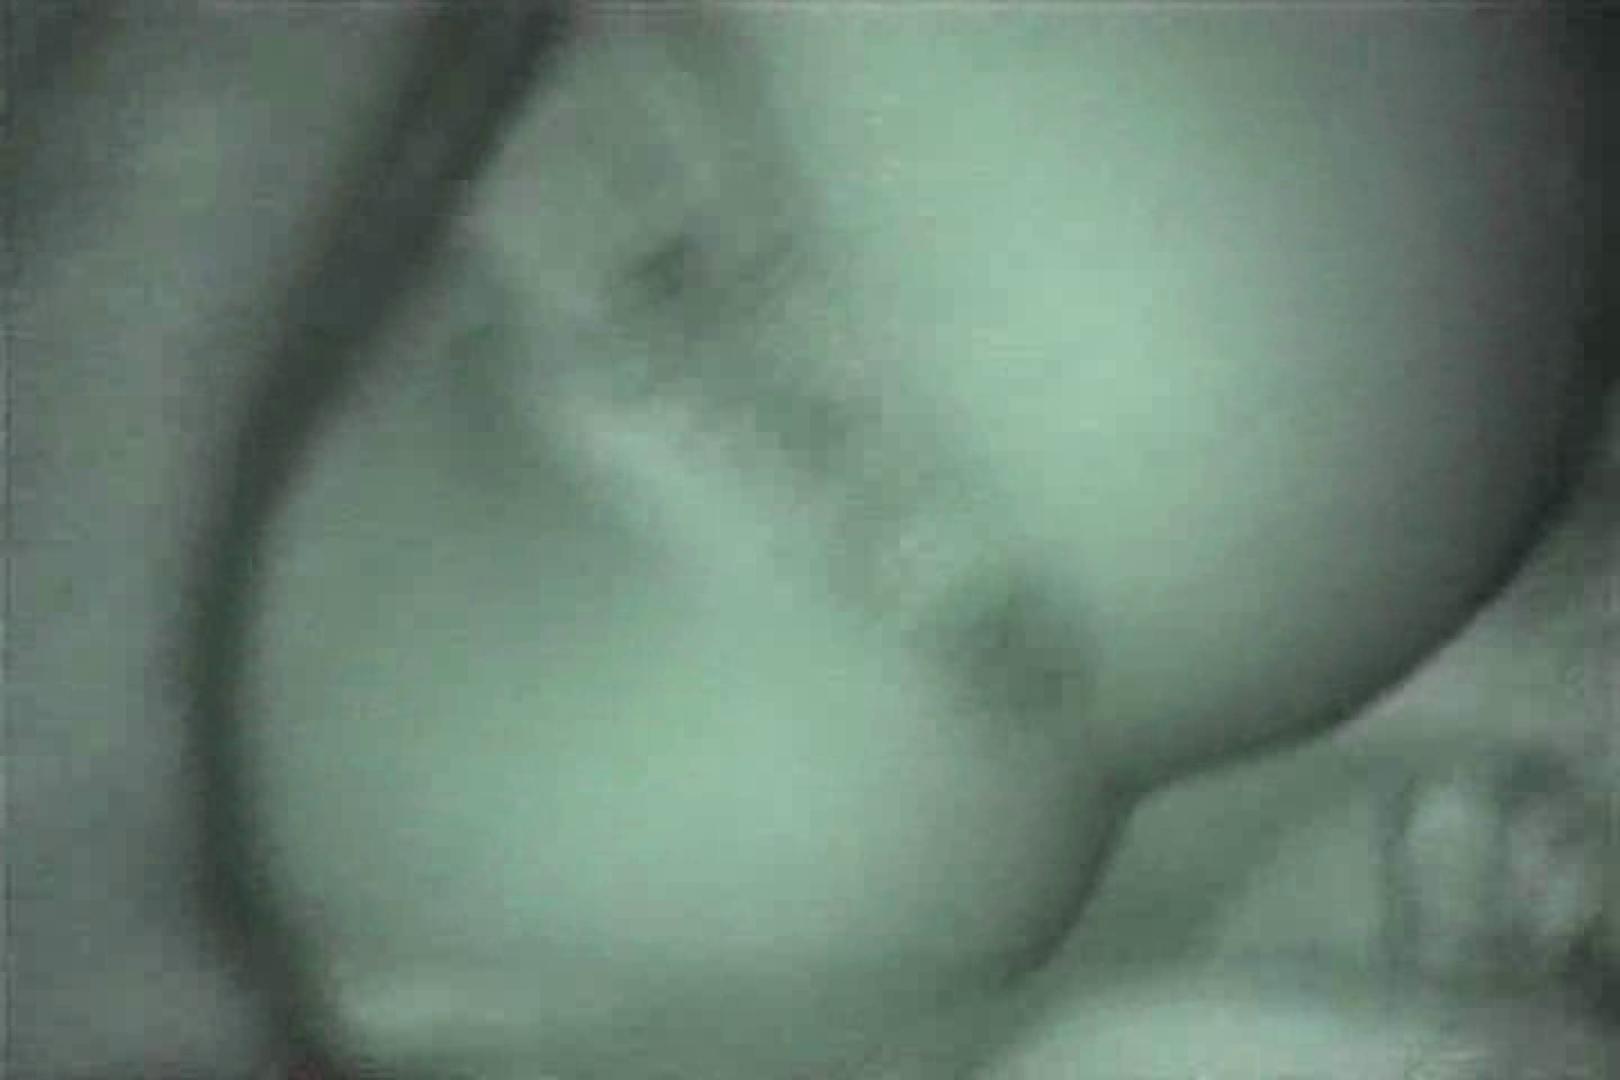 MASAさんの待ち伏せ撮り! 赤外線カーセックスVol.11 赤外線 | セックス  81画像 1